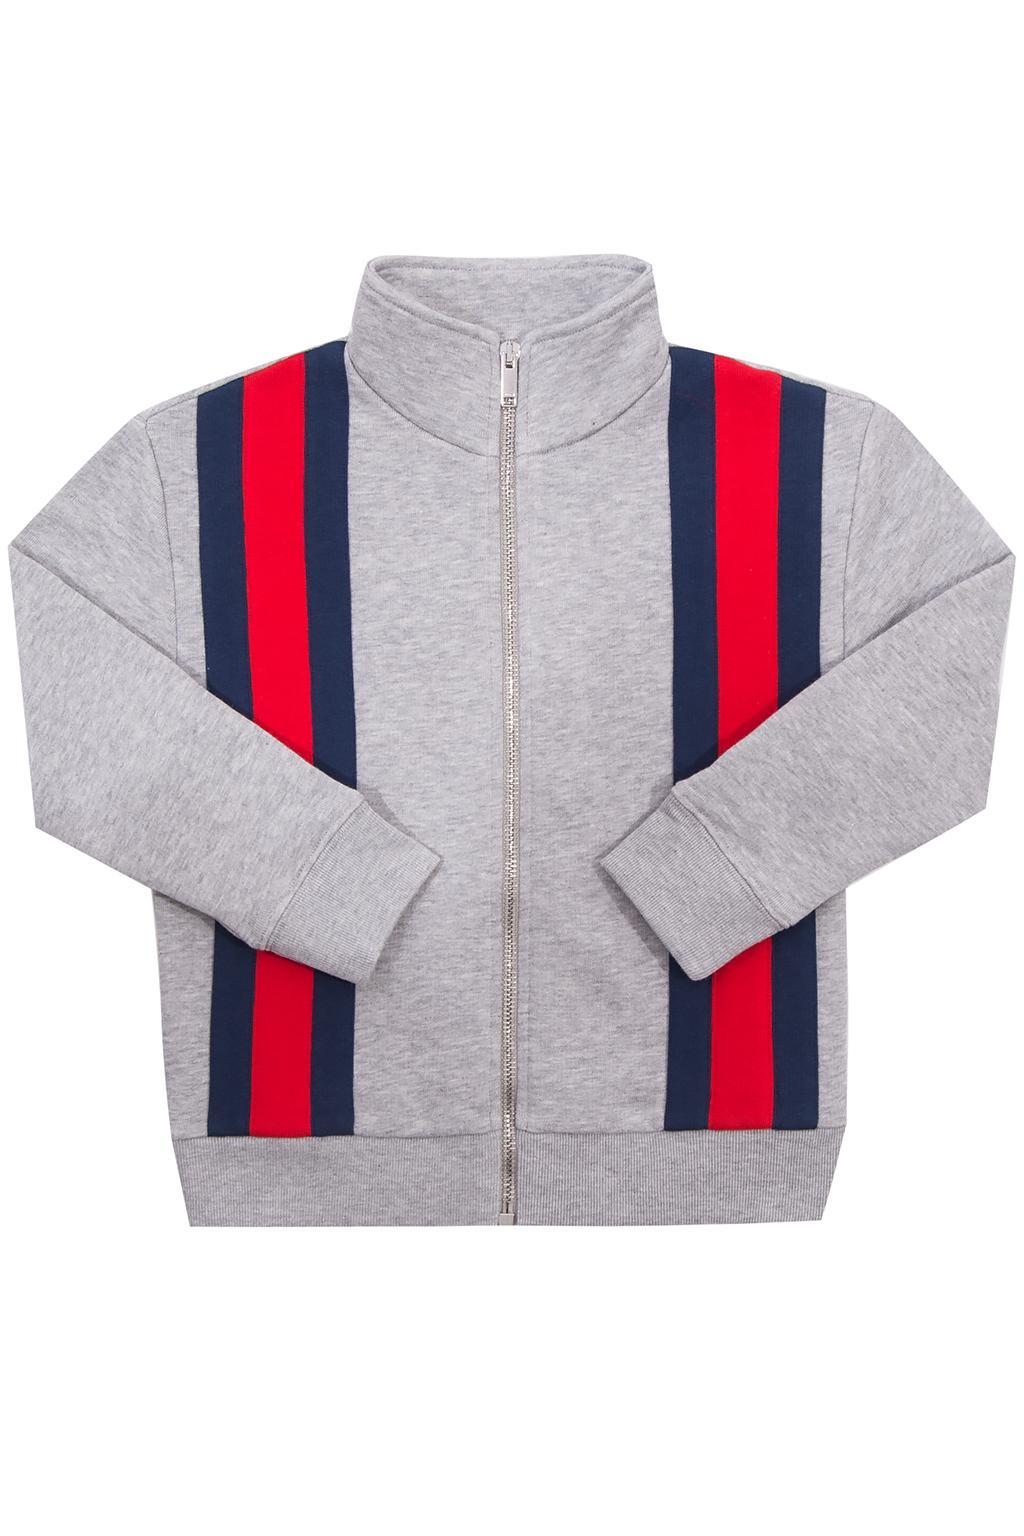 Gucci Kids Sweatshirt with a 'Web' stripe